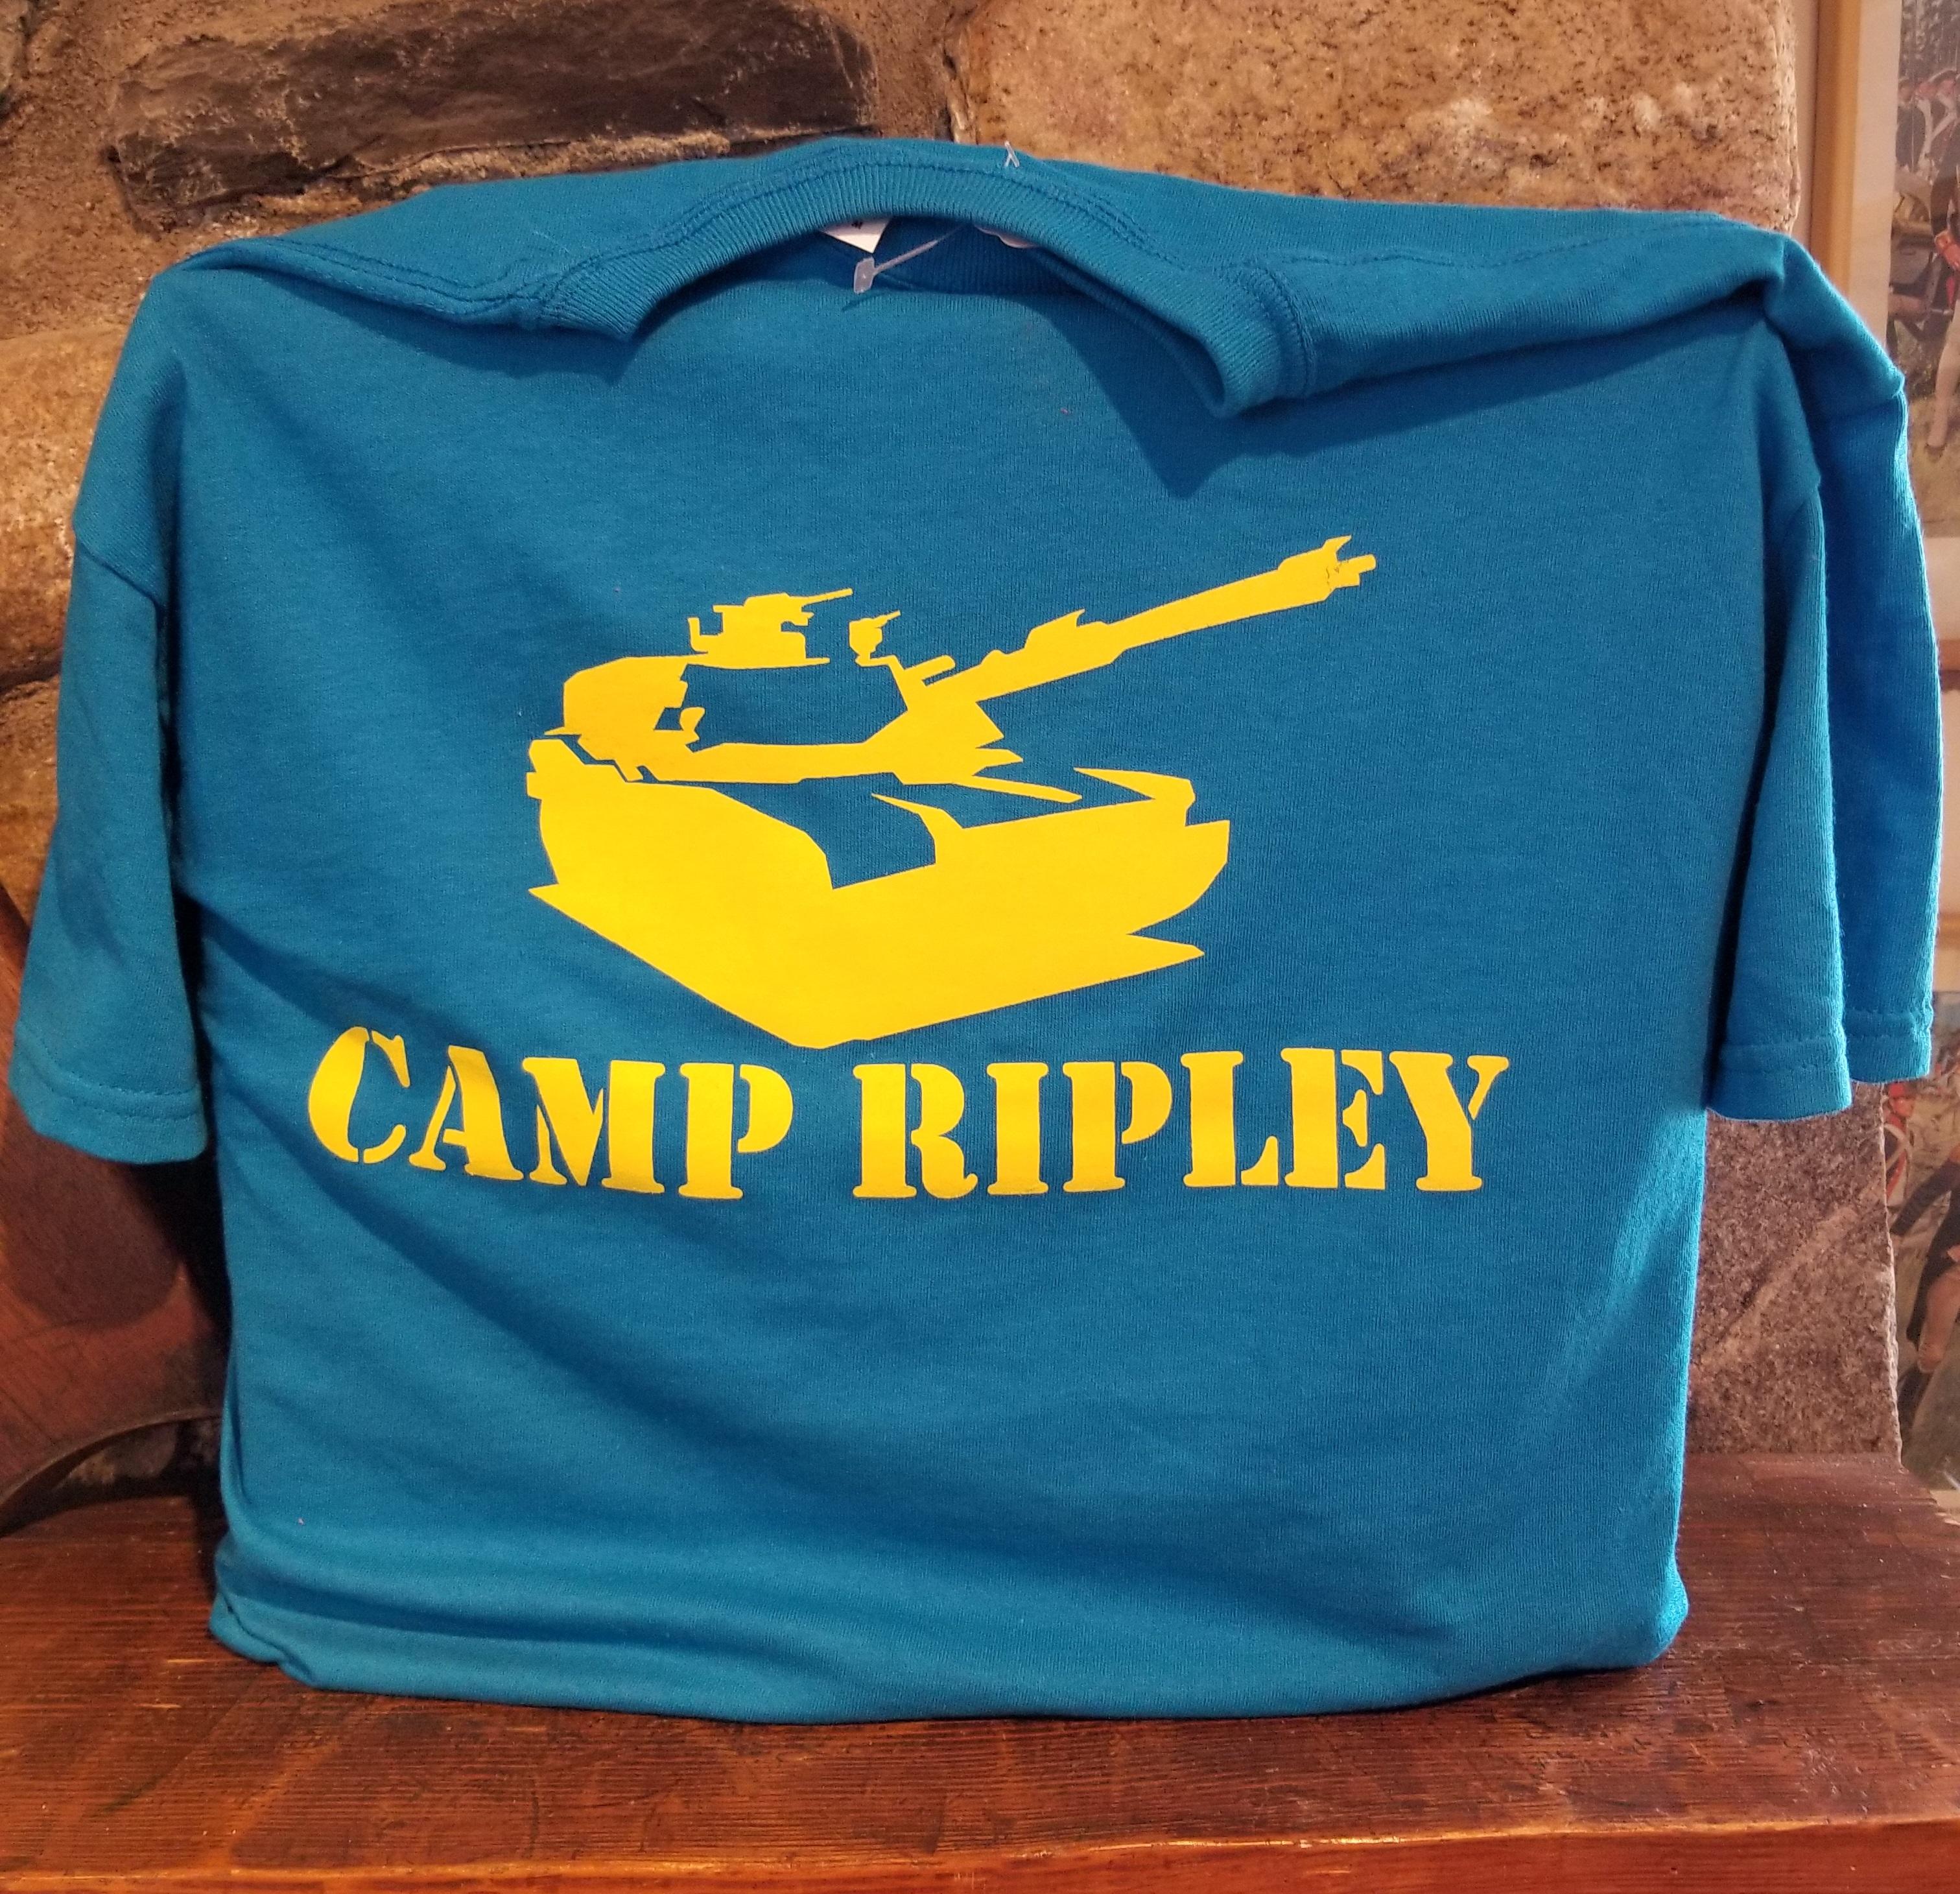 Camp Ripley T-Shirt